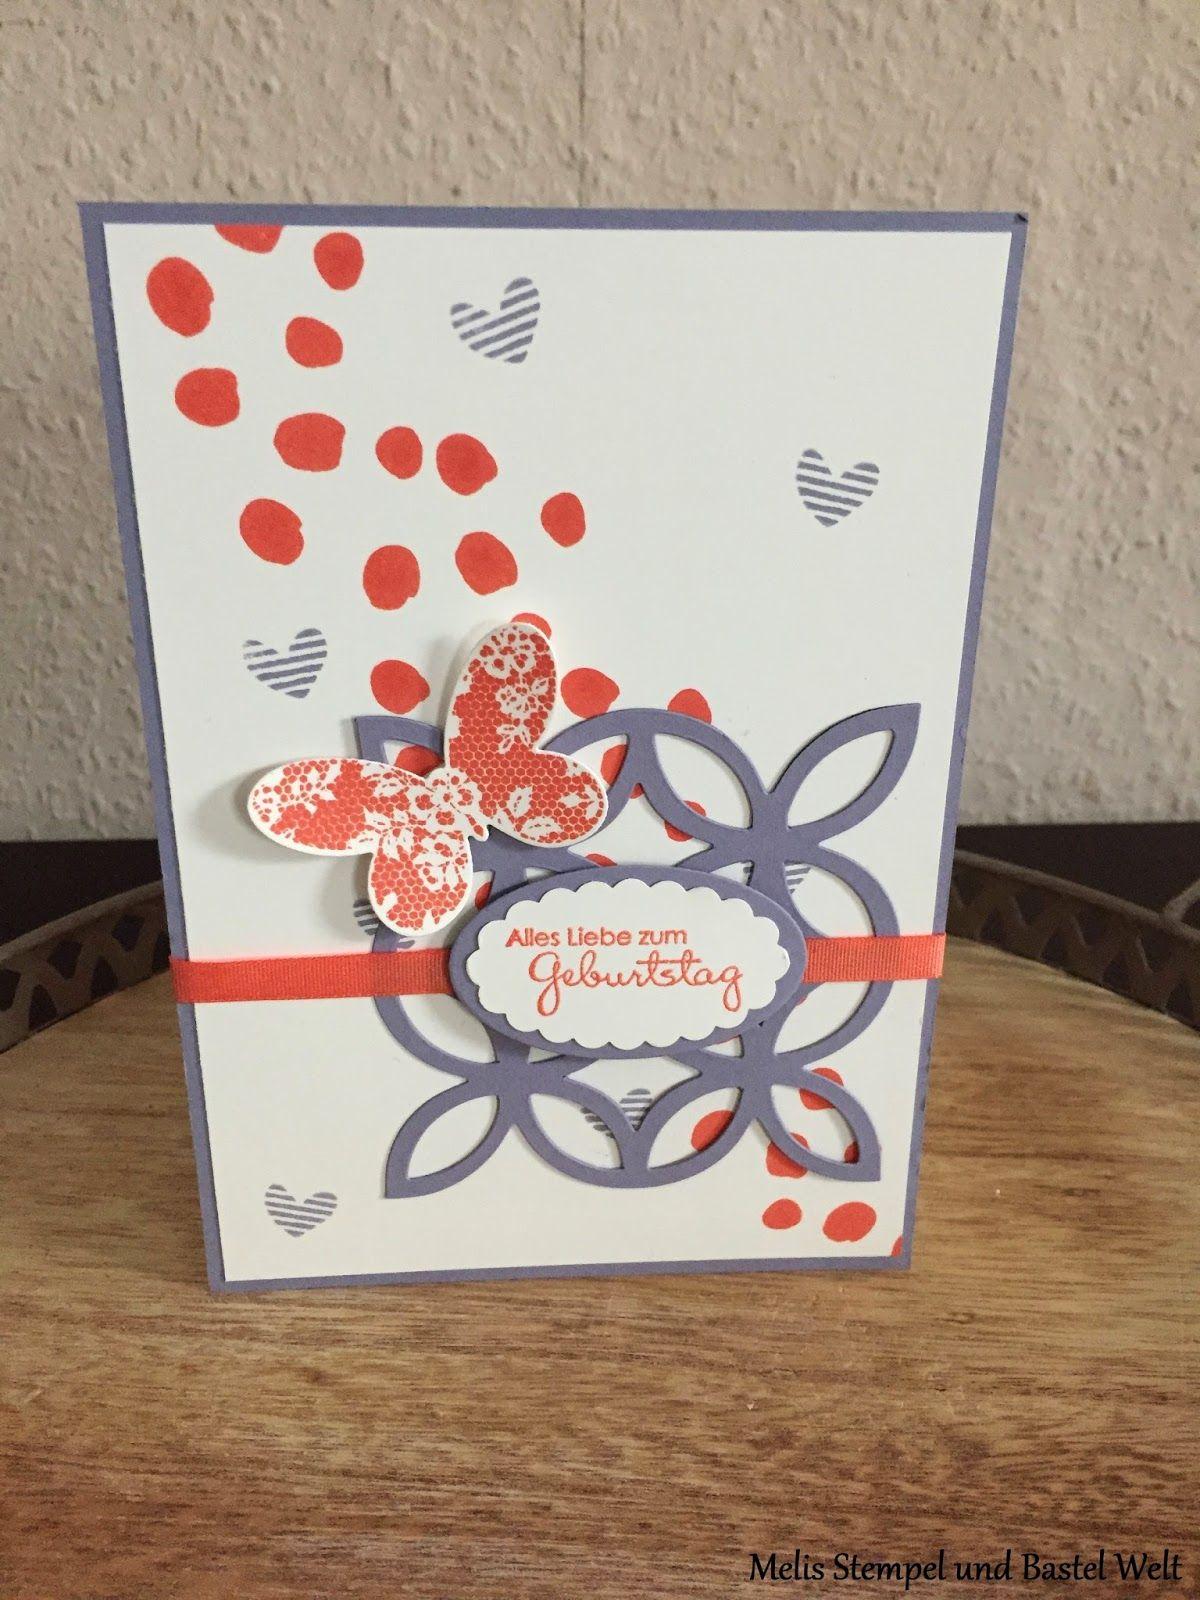 Stampin Up Geburtstagskarte Birthday Card Elegantes Gitter Schmetterlingsgruss Butterfly Schmetterling SAB Sale A Bration 2015 Tag Der Tage